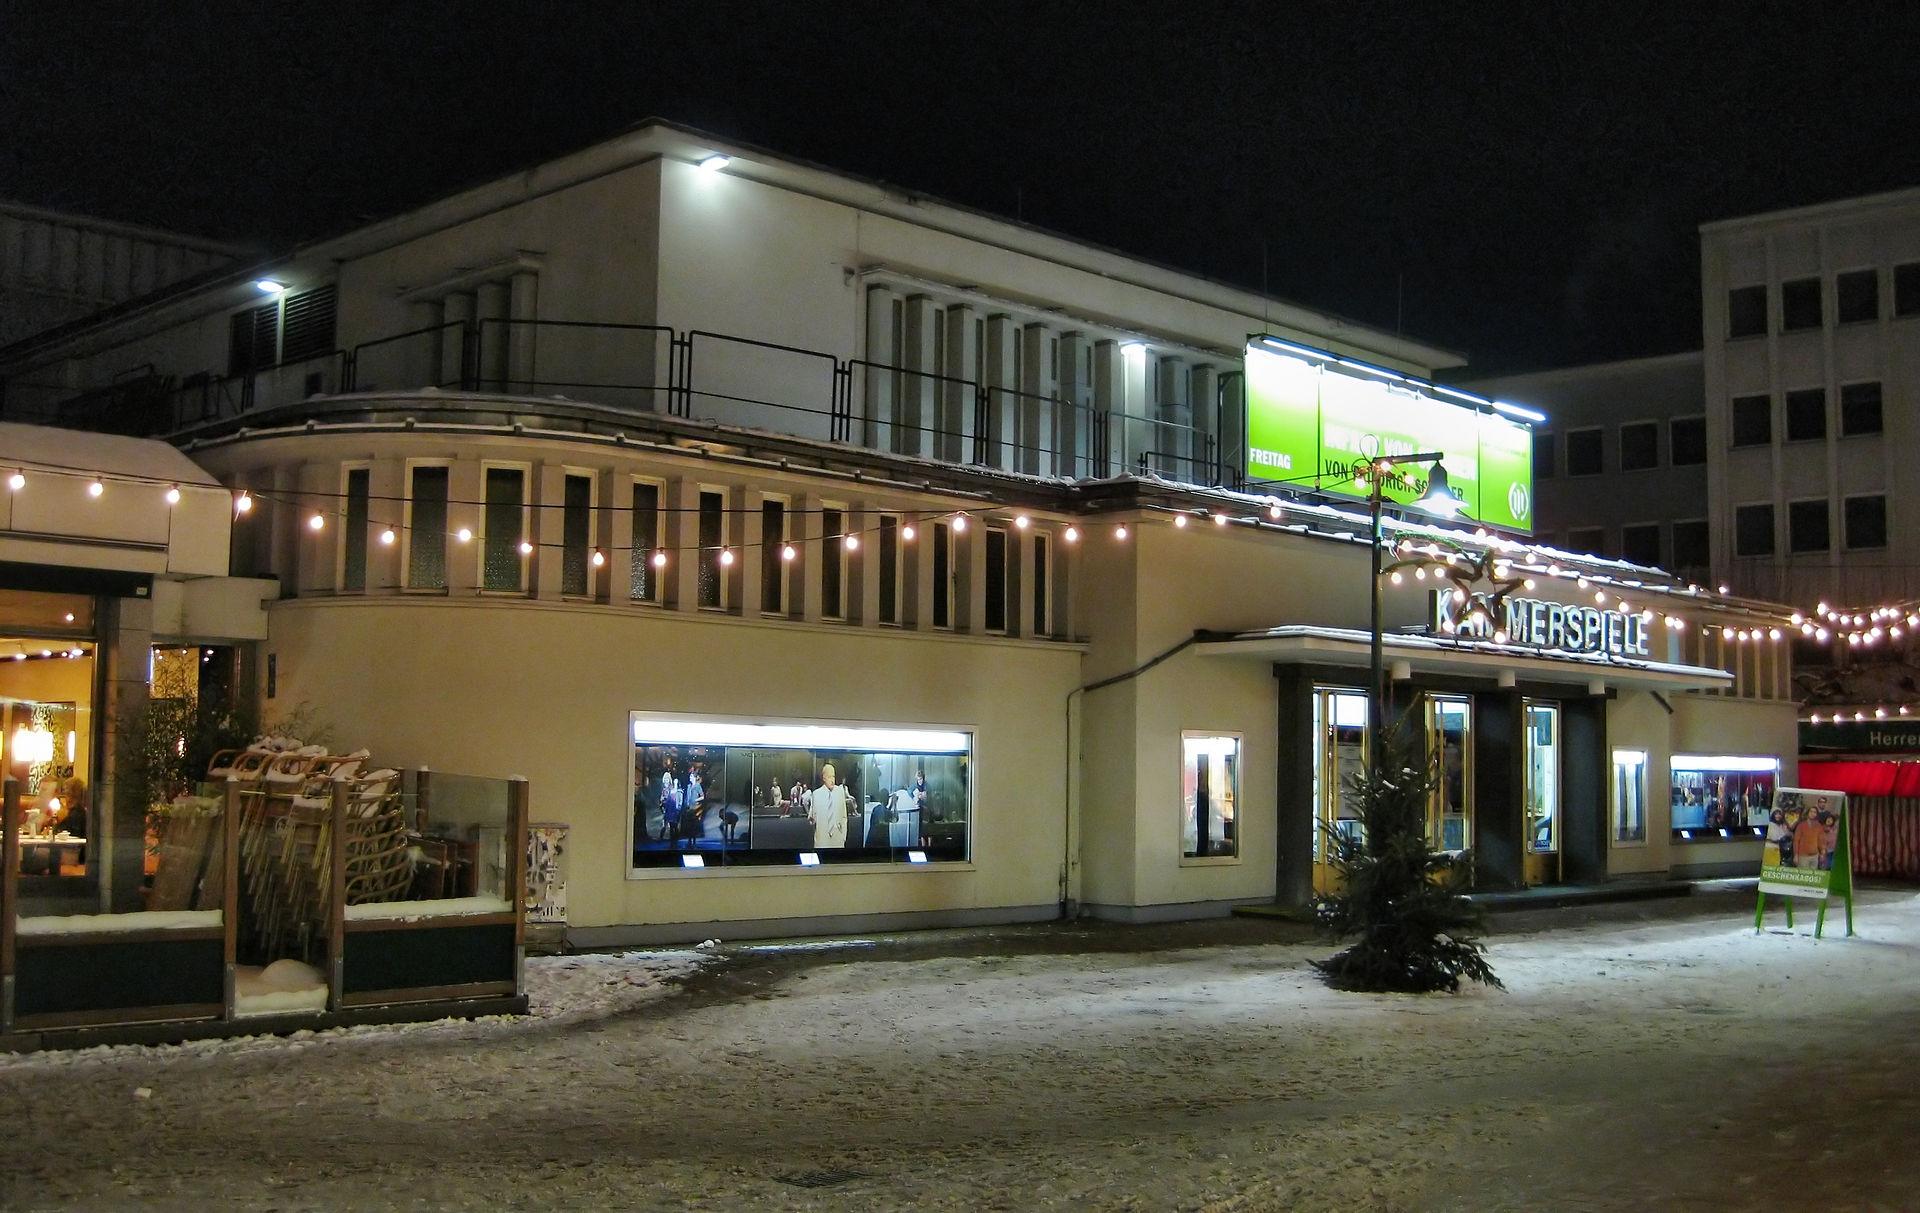 Bild Kammerspiele Bad Godesberg